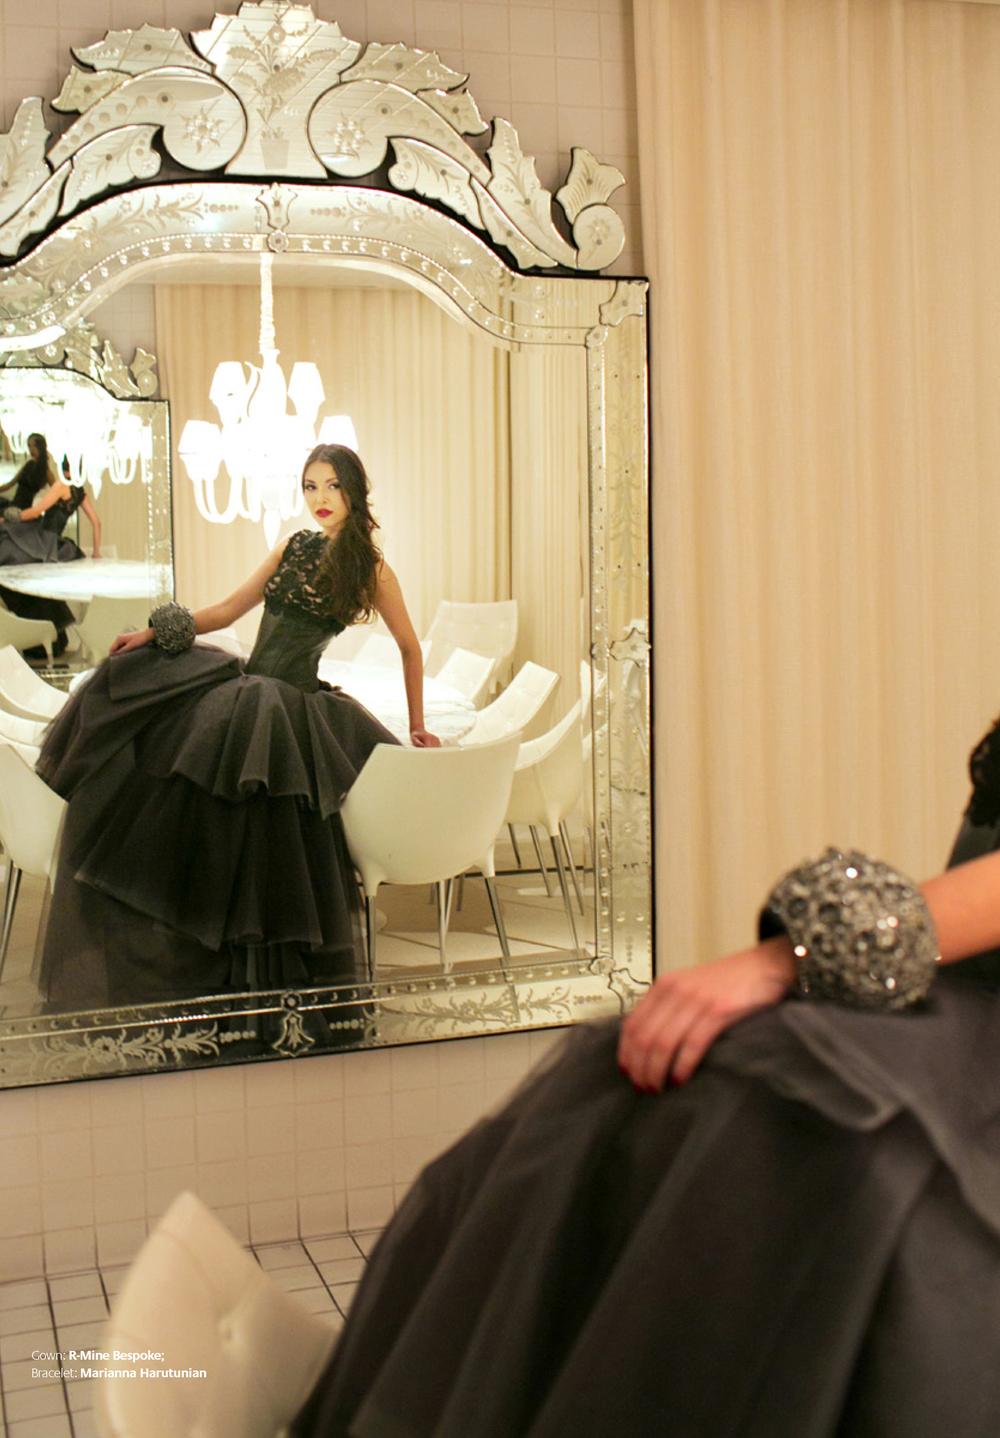 Marianne-Lozano-06.jpg